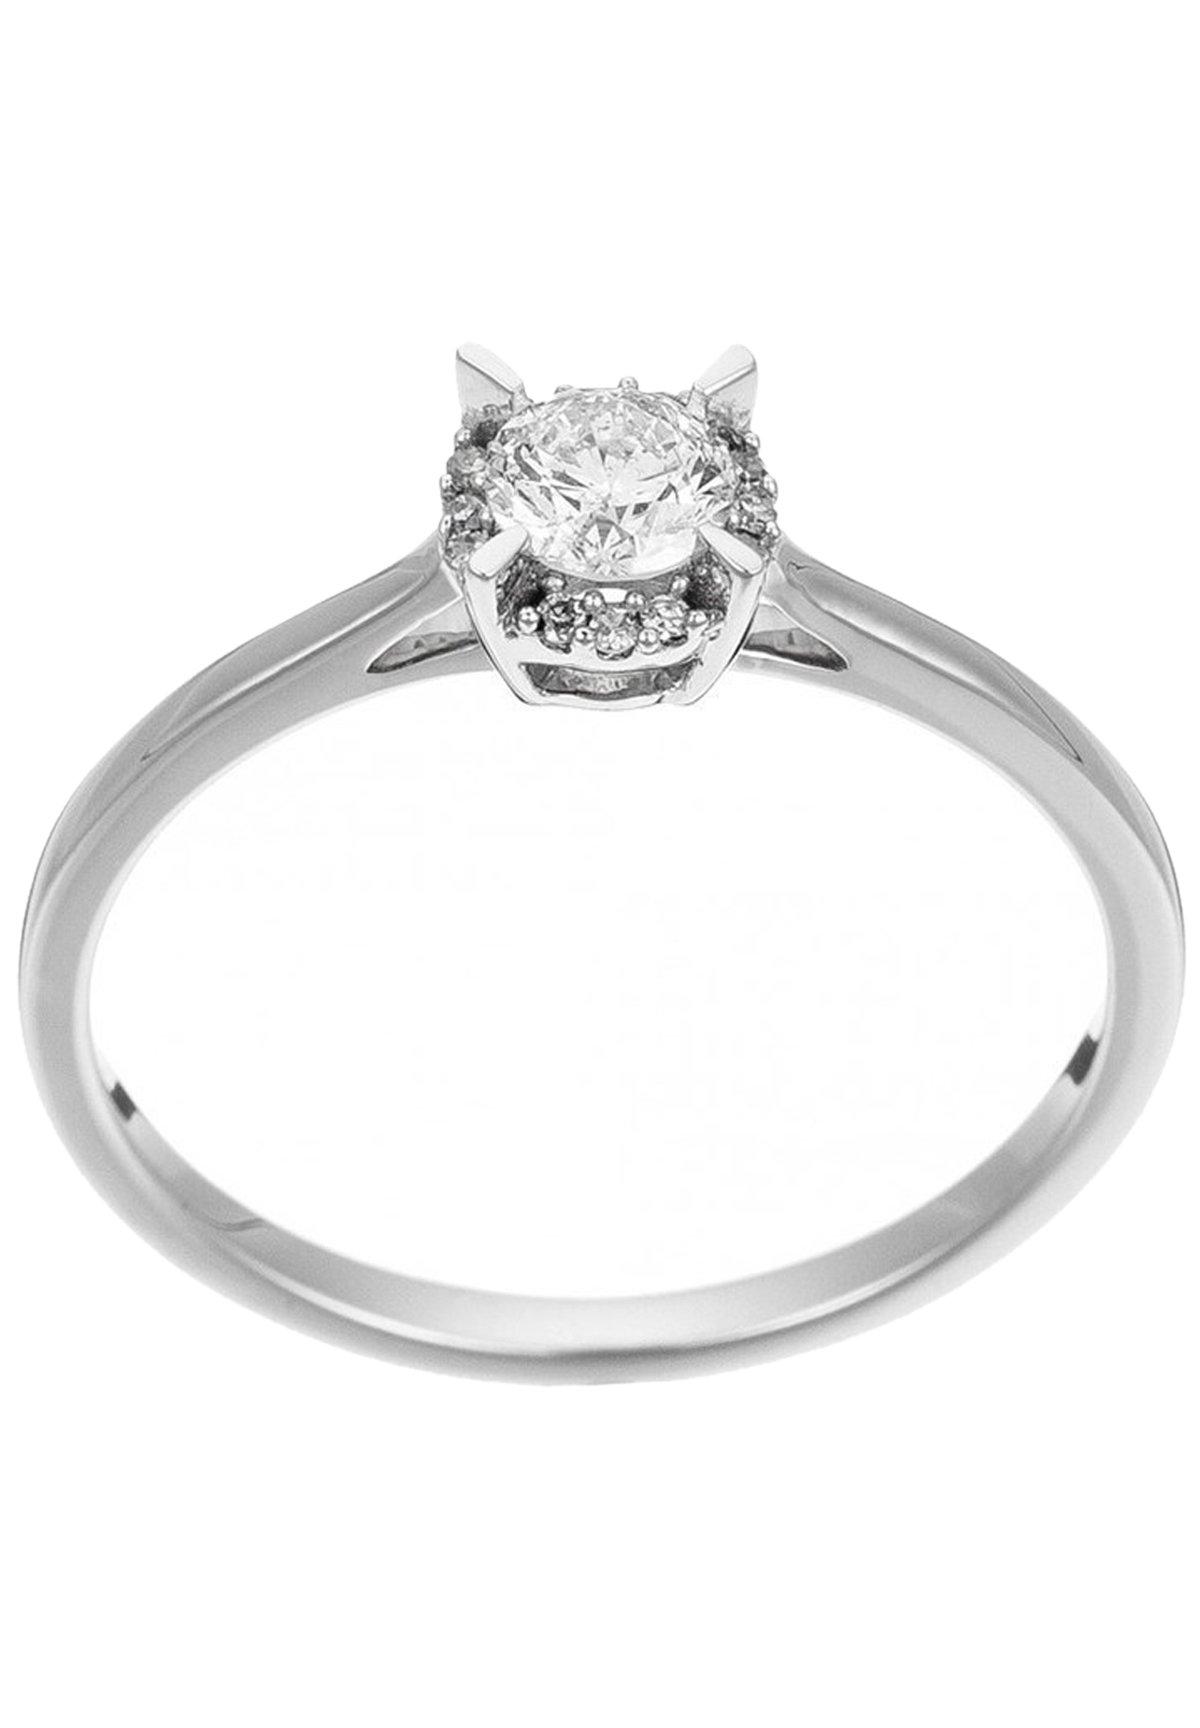 Damen WHITE GOLD RING 18K CERTIFIED 13 DIAMONDS HSI AND 12 DIAMONDS 0.03 CT - Ring